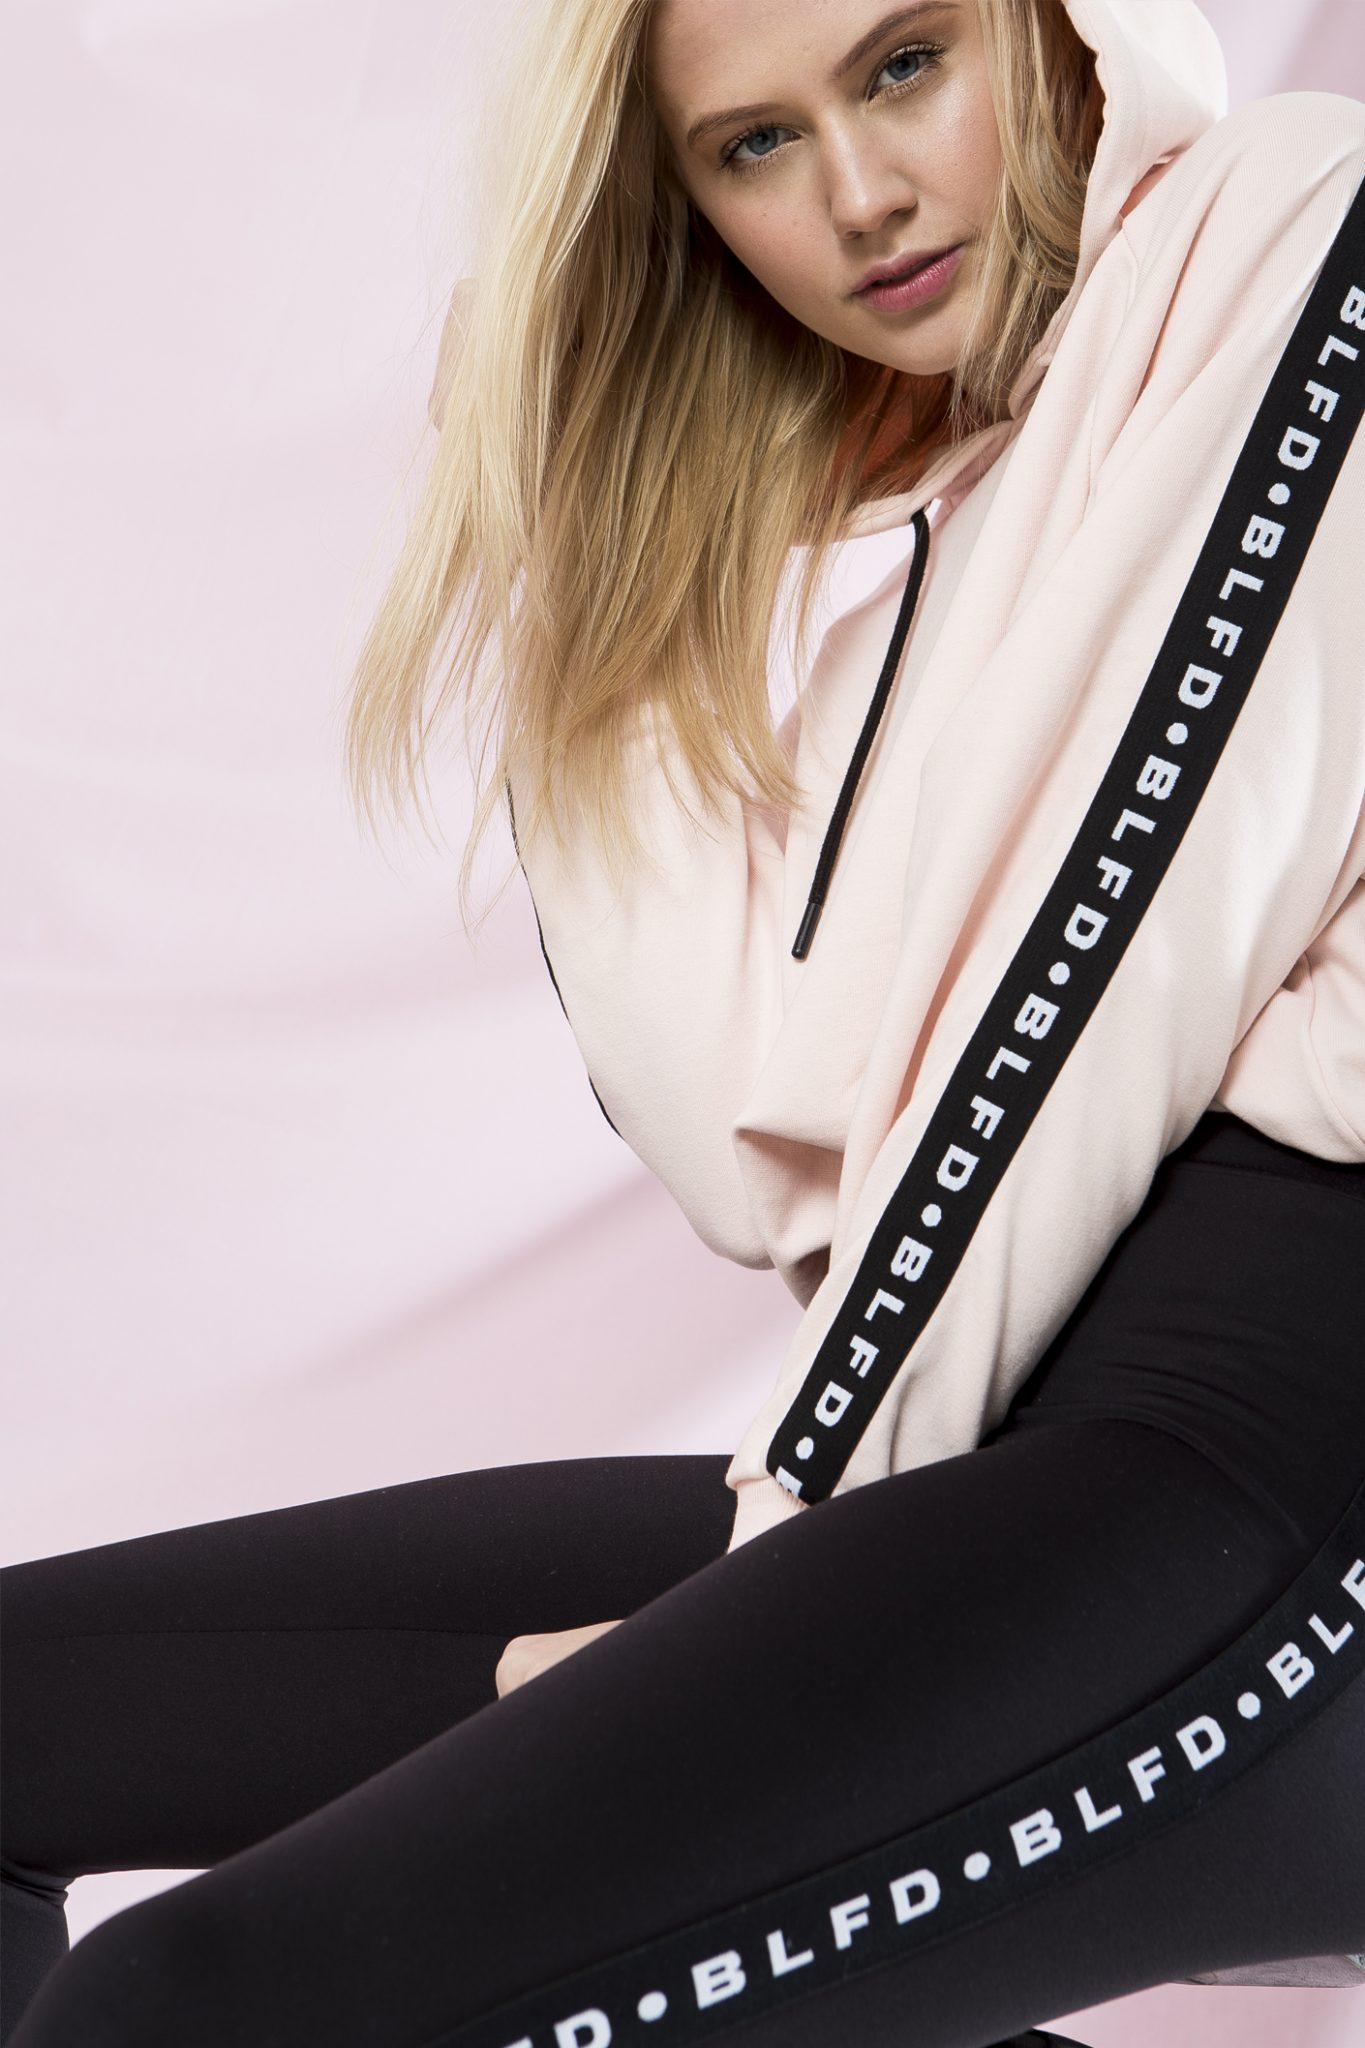 fashion-photography-of-womens-gymwear-shot-in-manchester